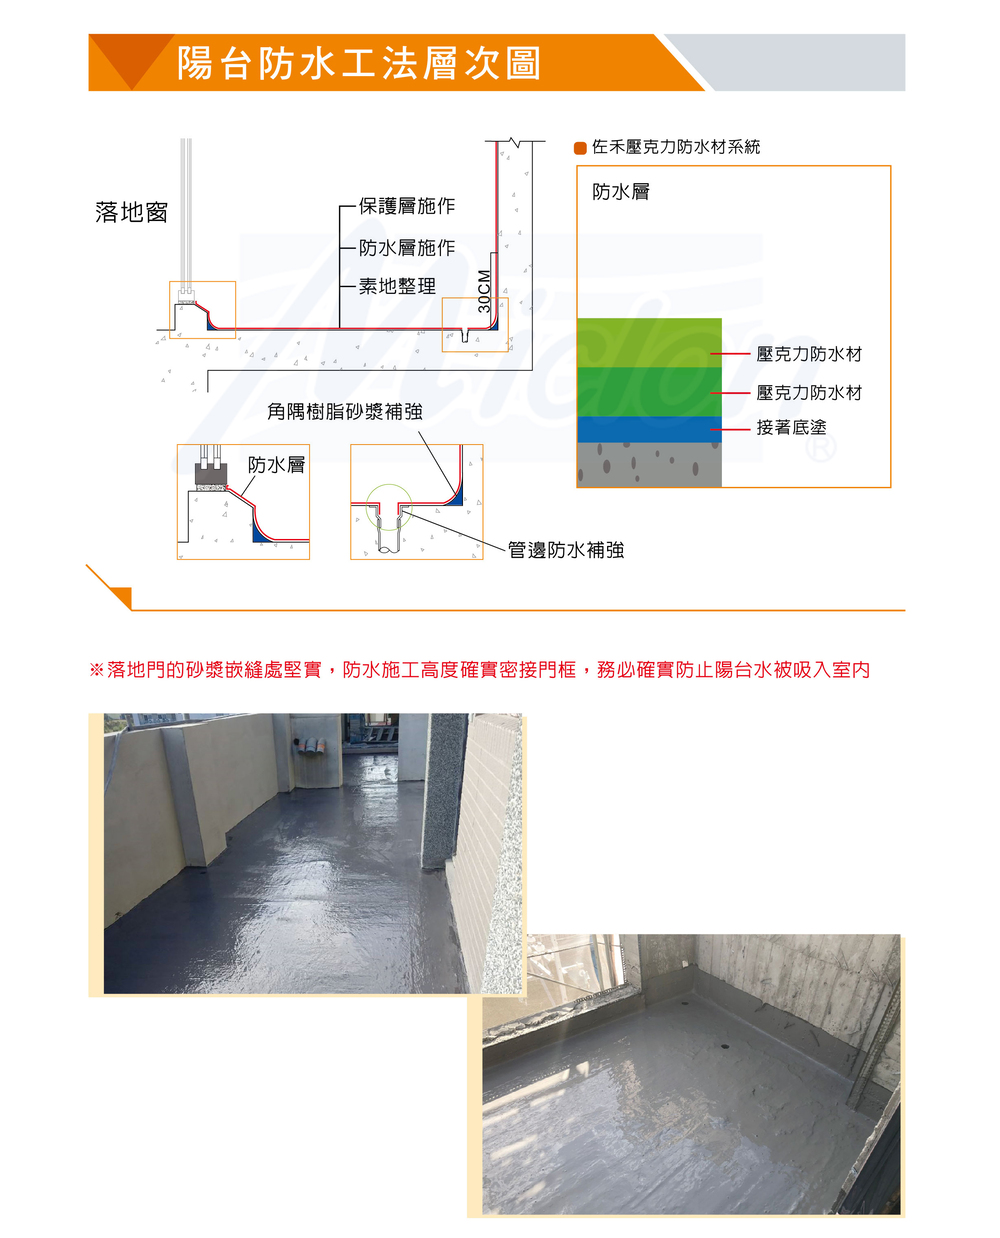 https://www.miclon.com.tw/images/webimg/medium/210305034650.jpeg